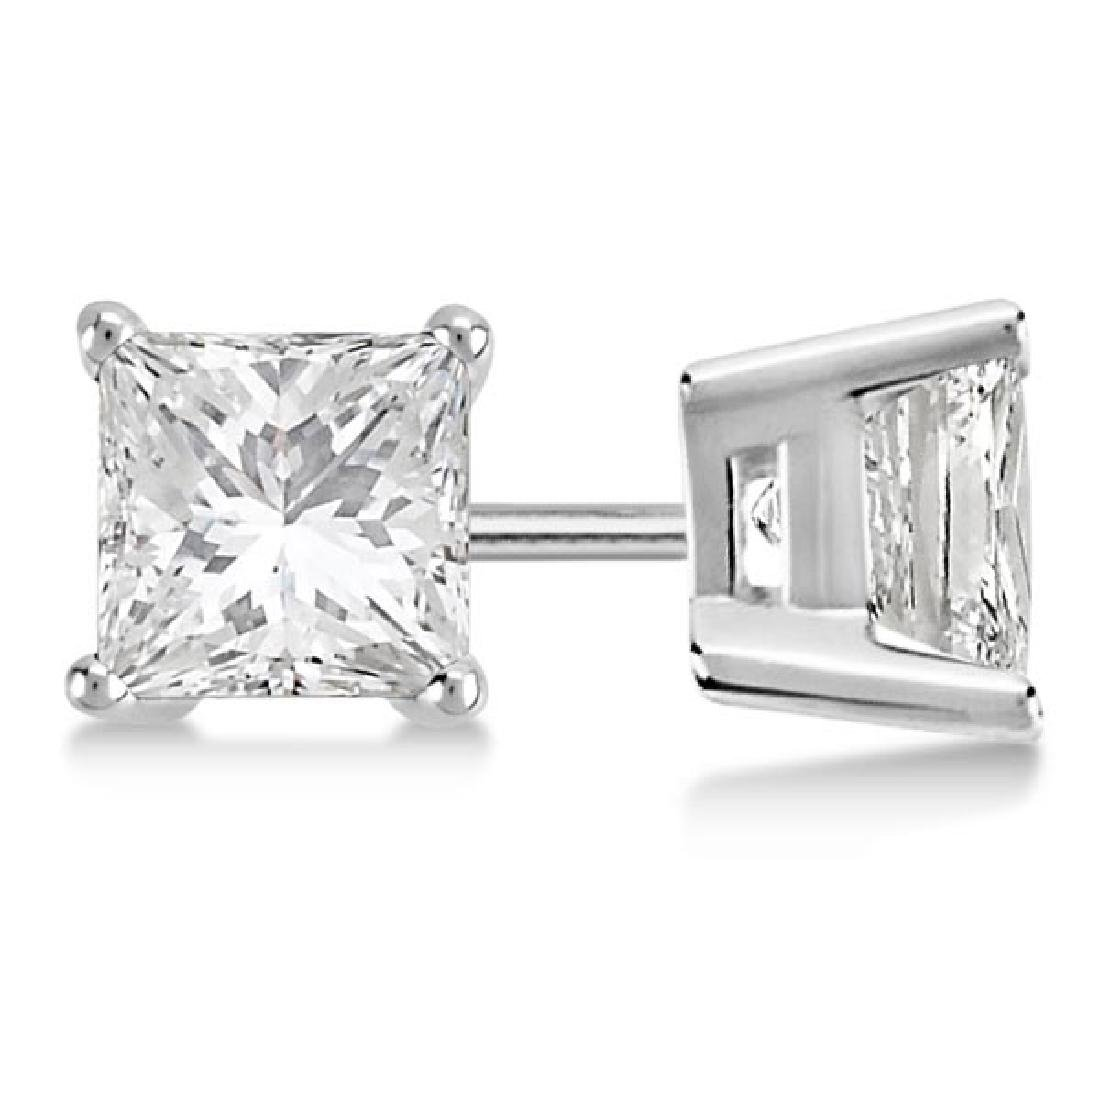 Certified 1.4 CTW Princess Diamond Stud Earrings D/SI2